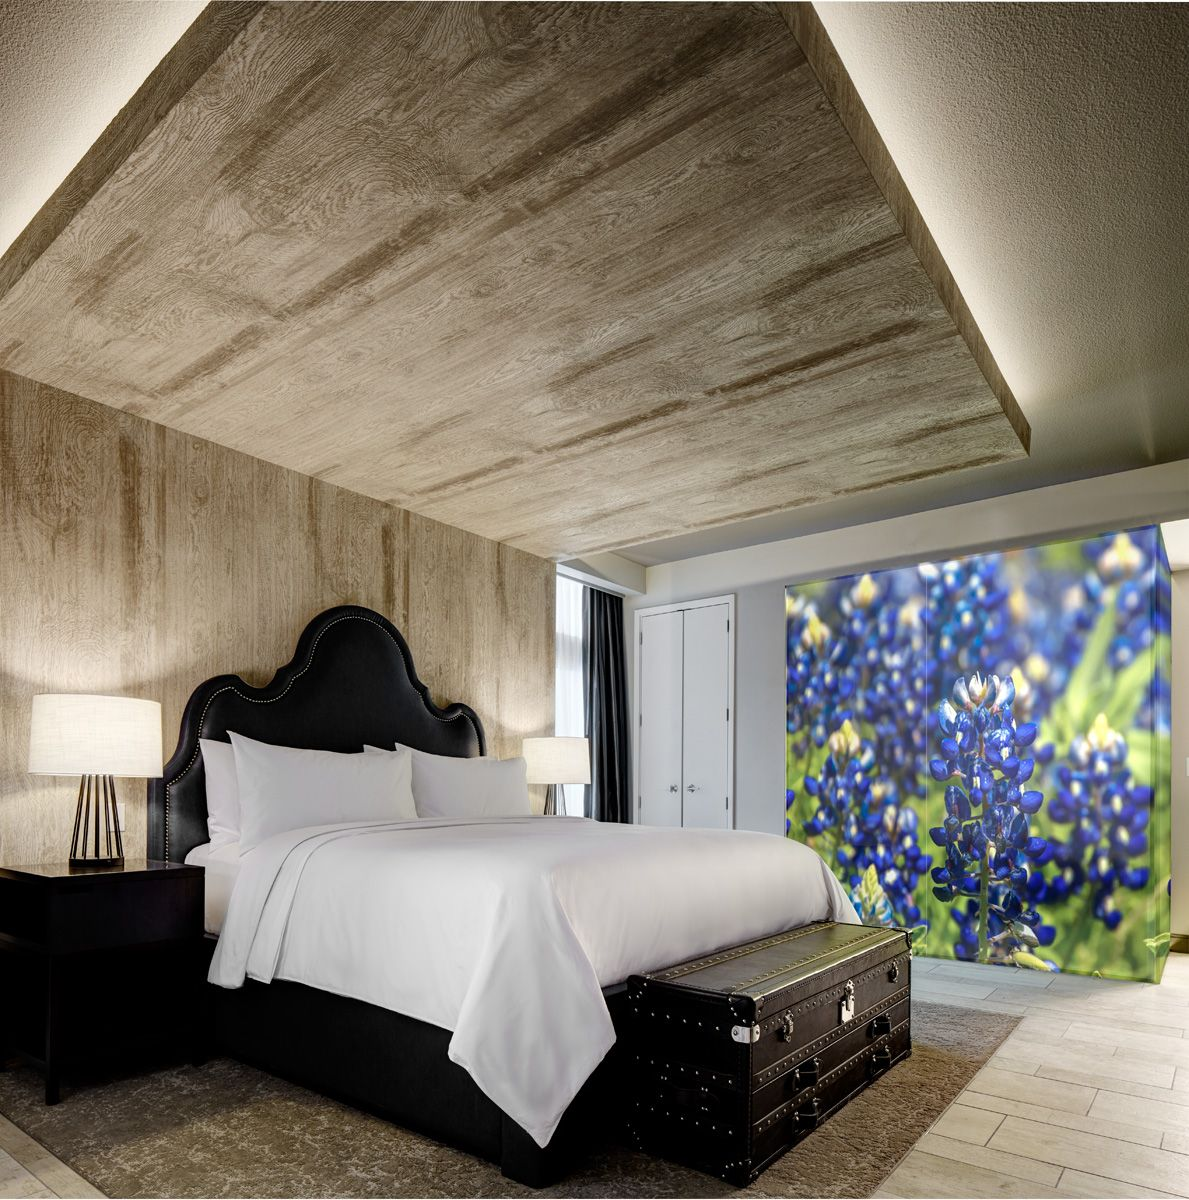 Archer's Den Bedroom Area Archer hotel, West campus, Hotel